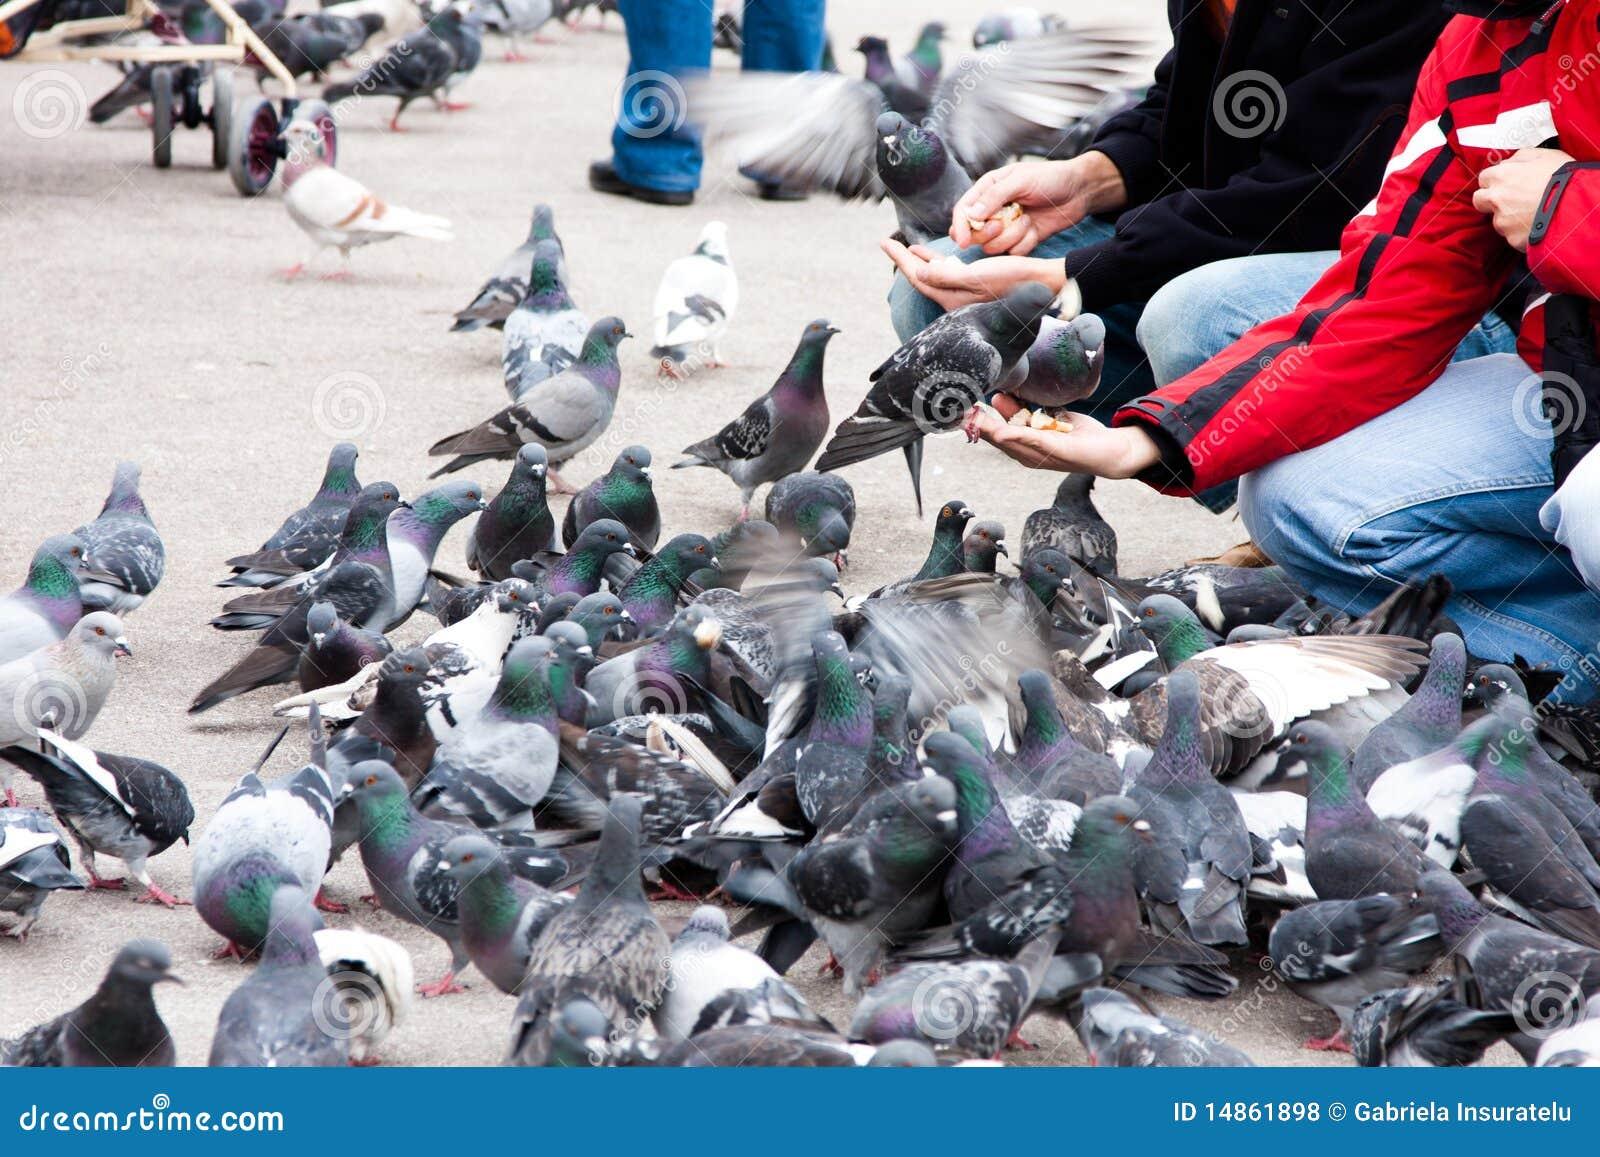 Feeding pigeons